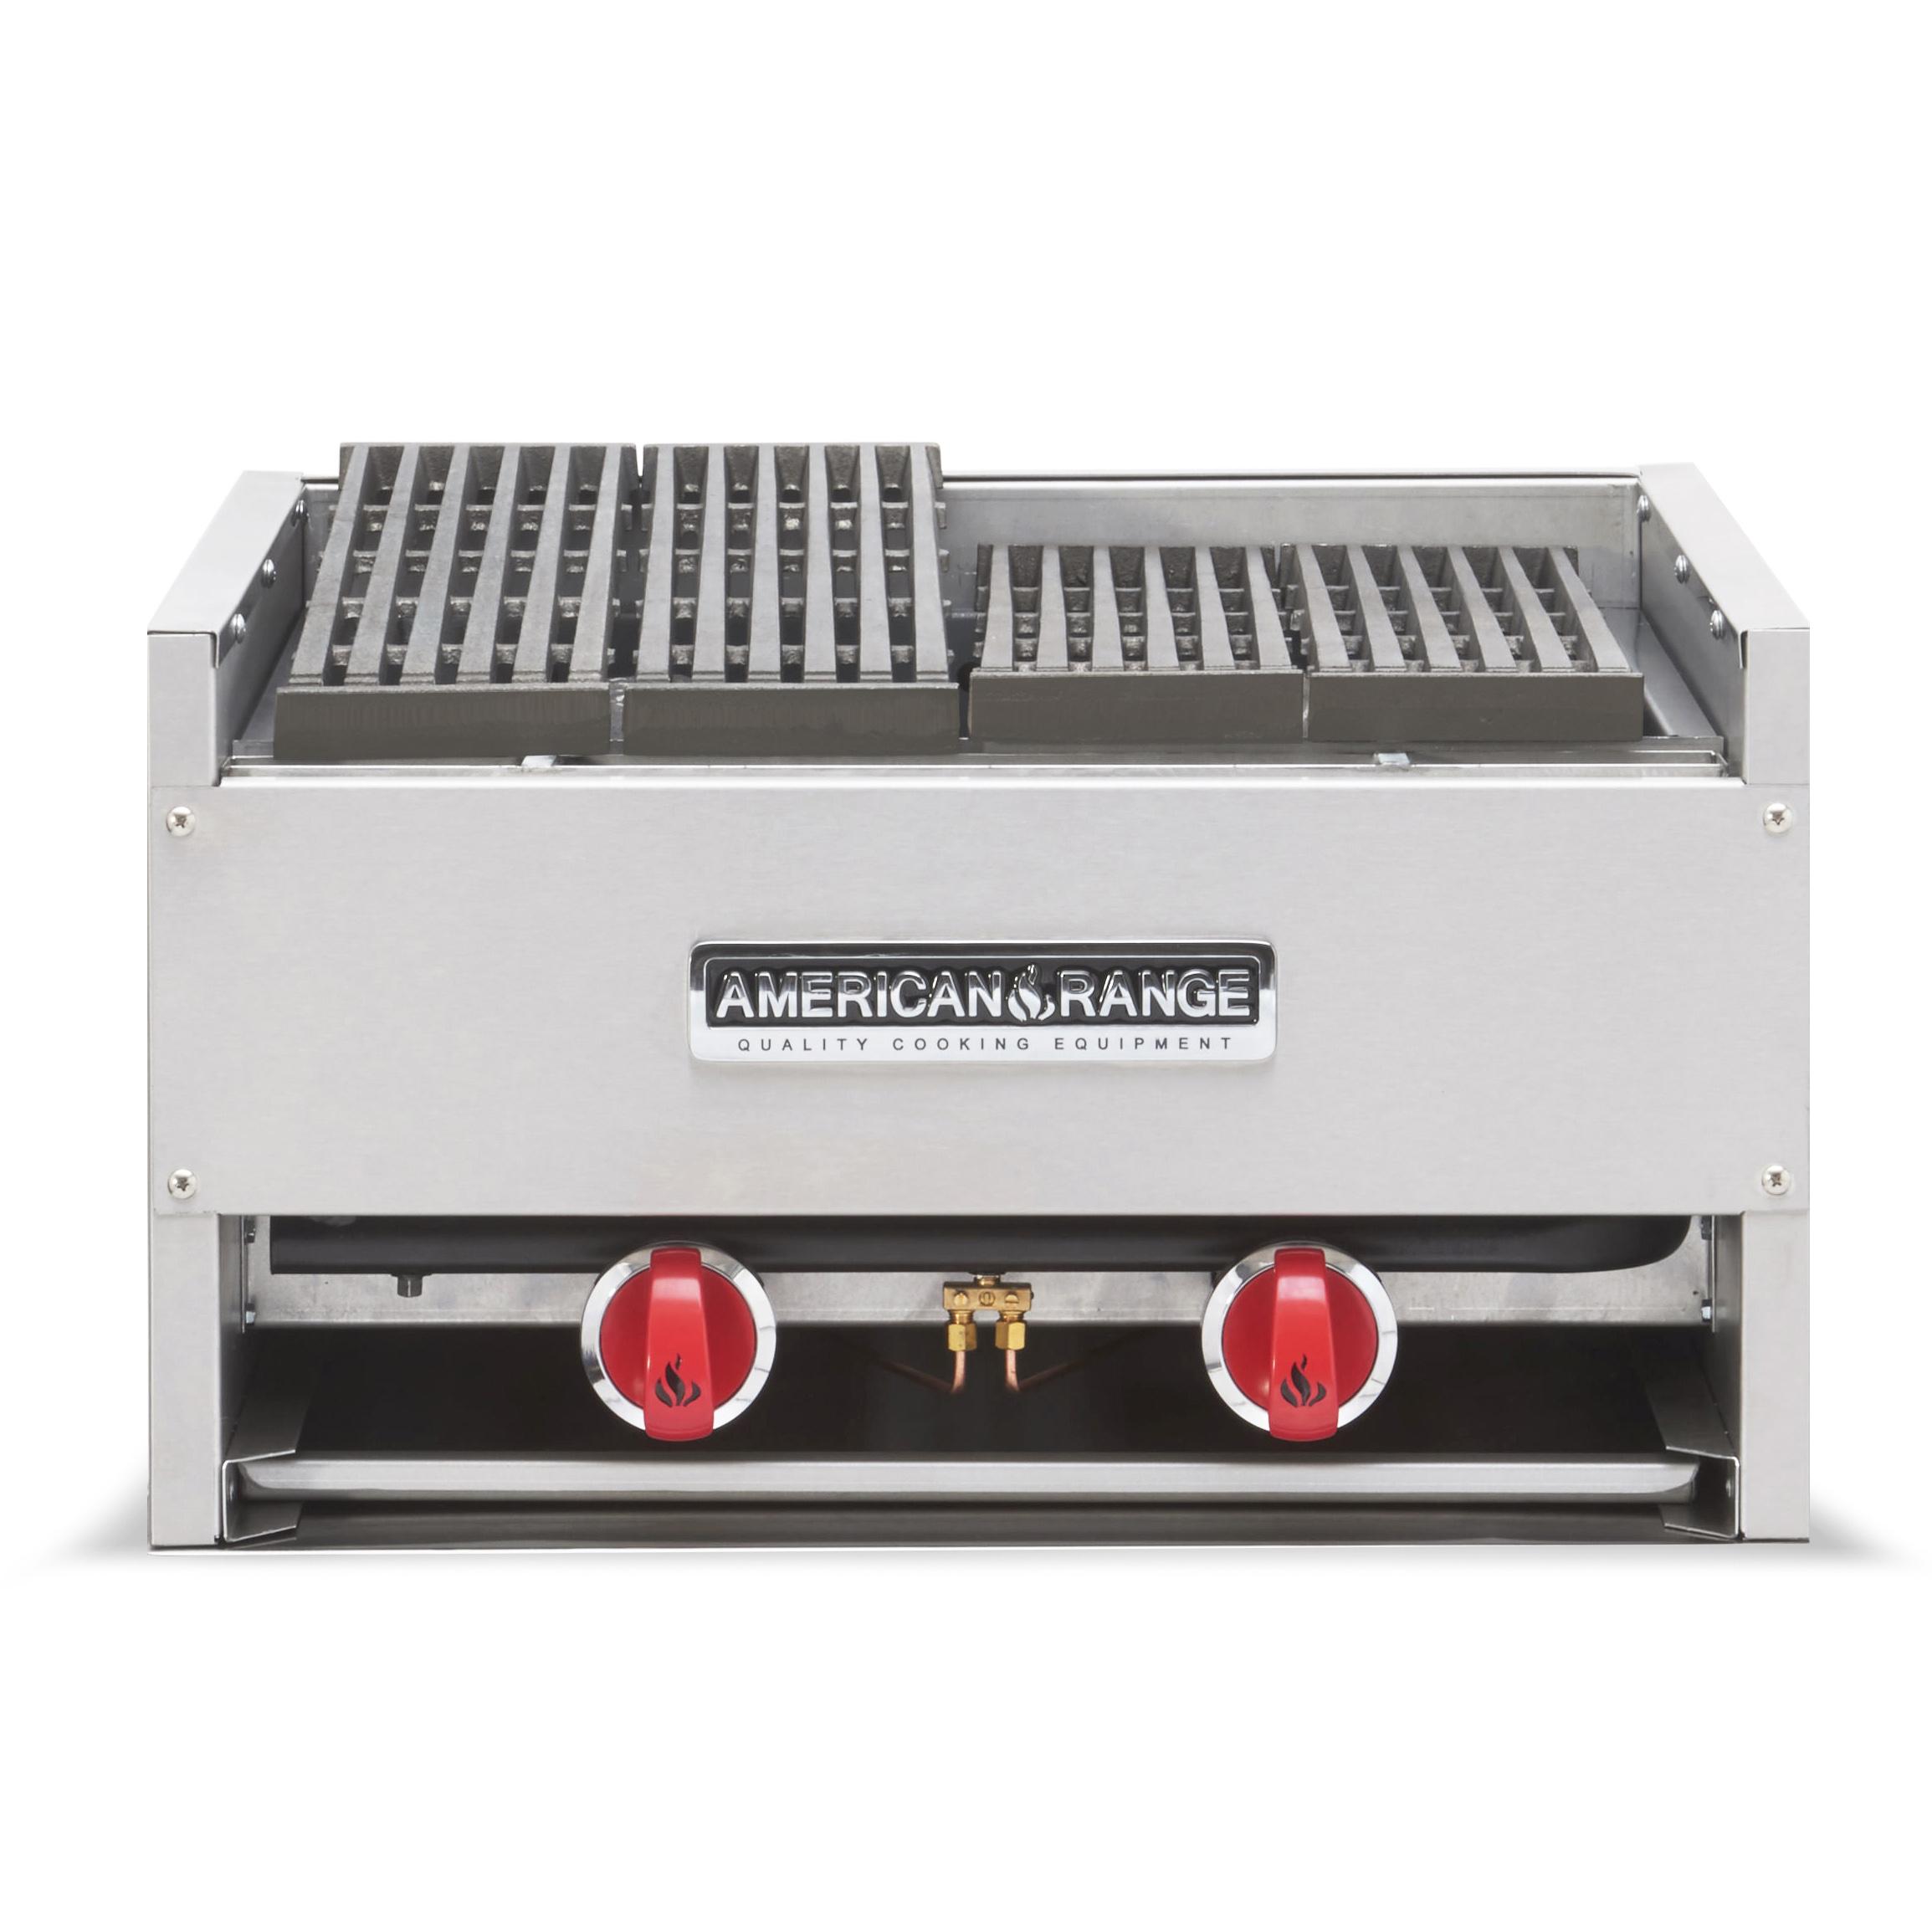 American Range AECB-36 charbroiler, gas, countertop